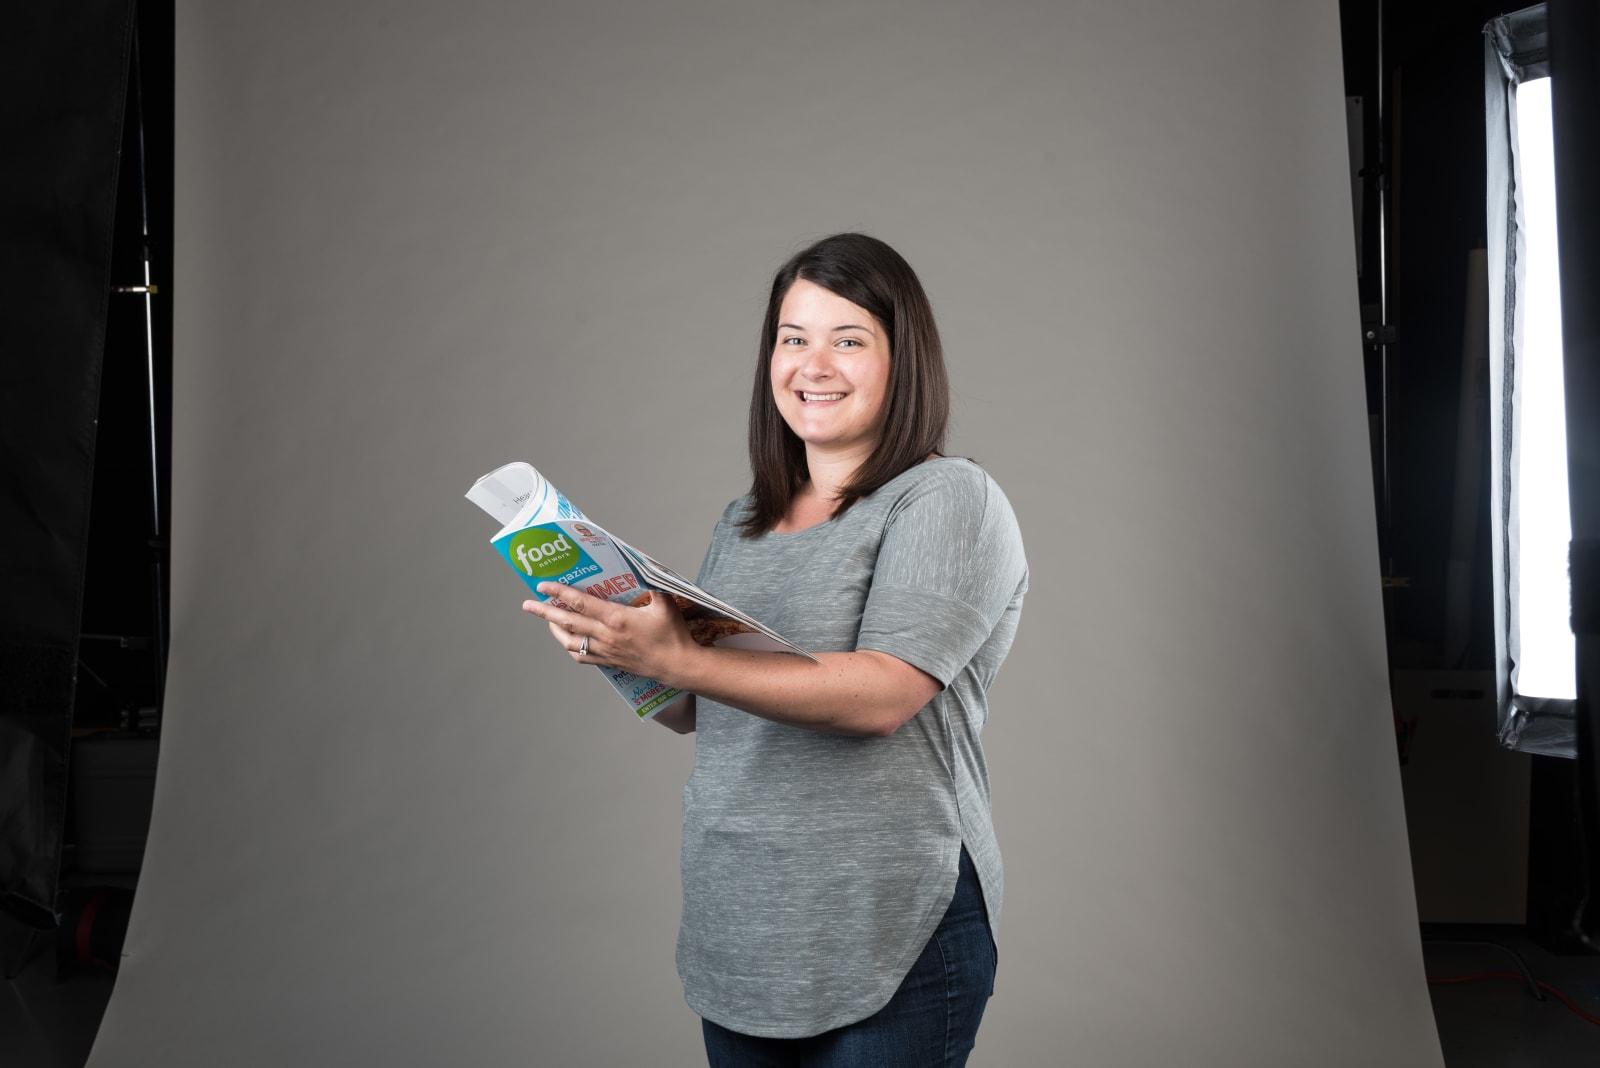 Jenny Brandenburg Reading